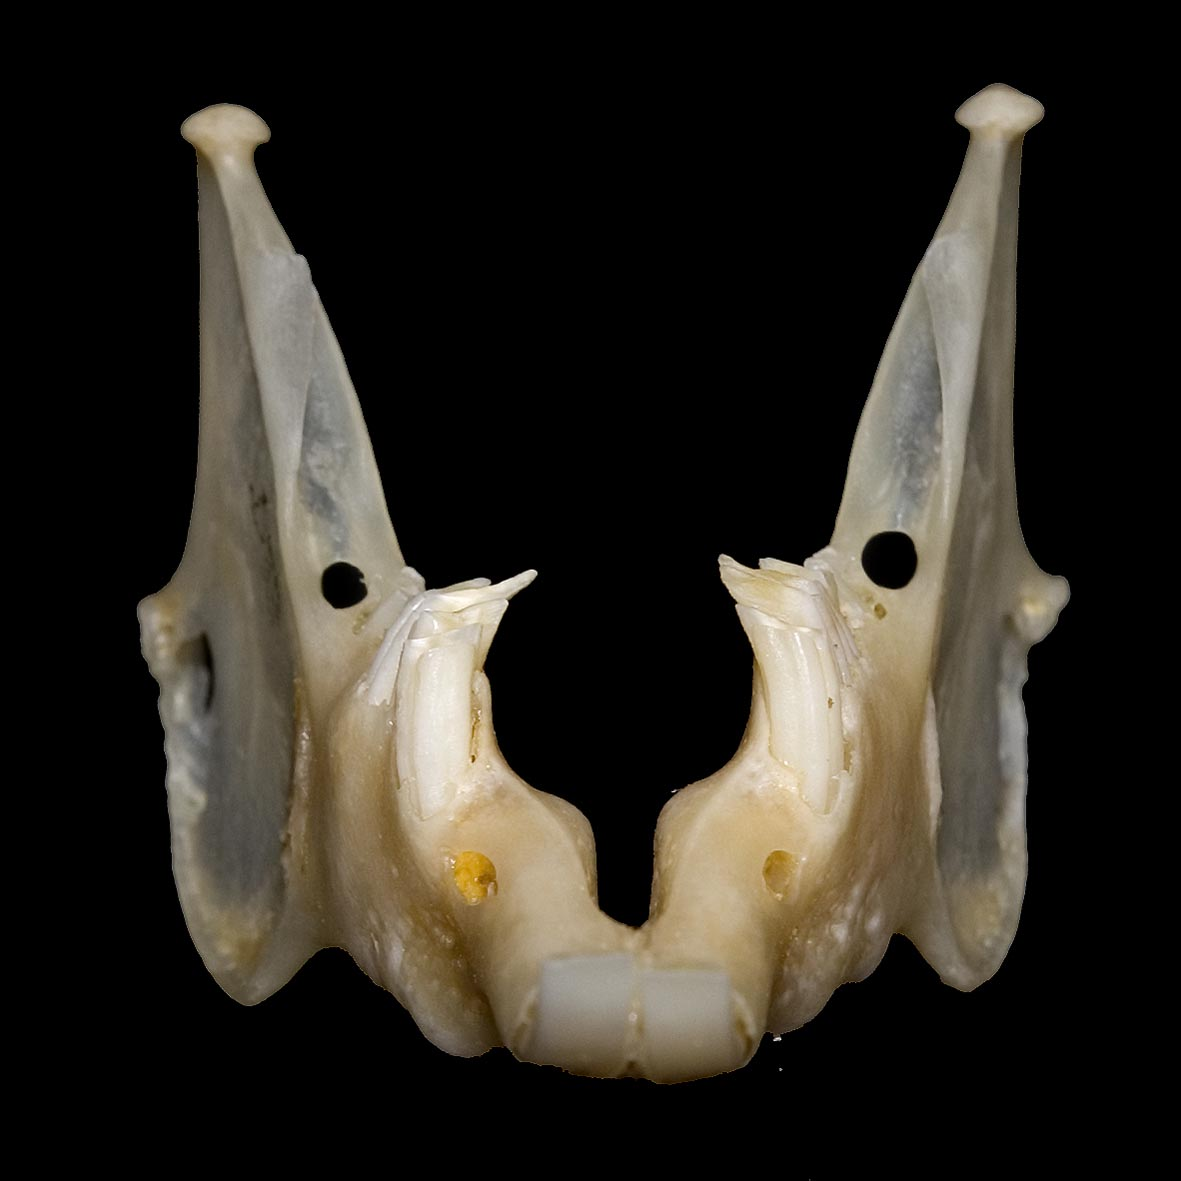 Mandible of rabbit with spurs on cheek teeth